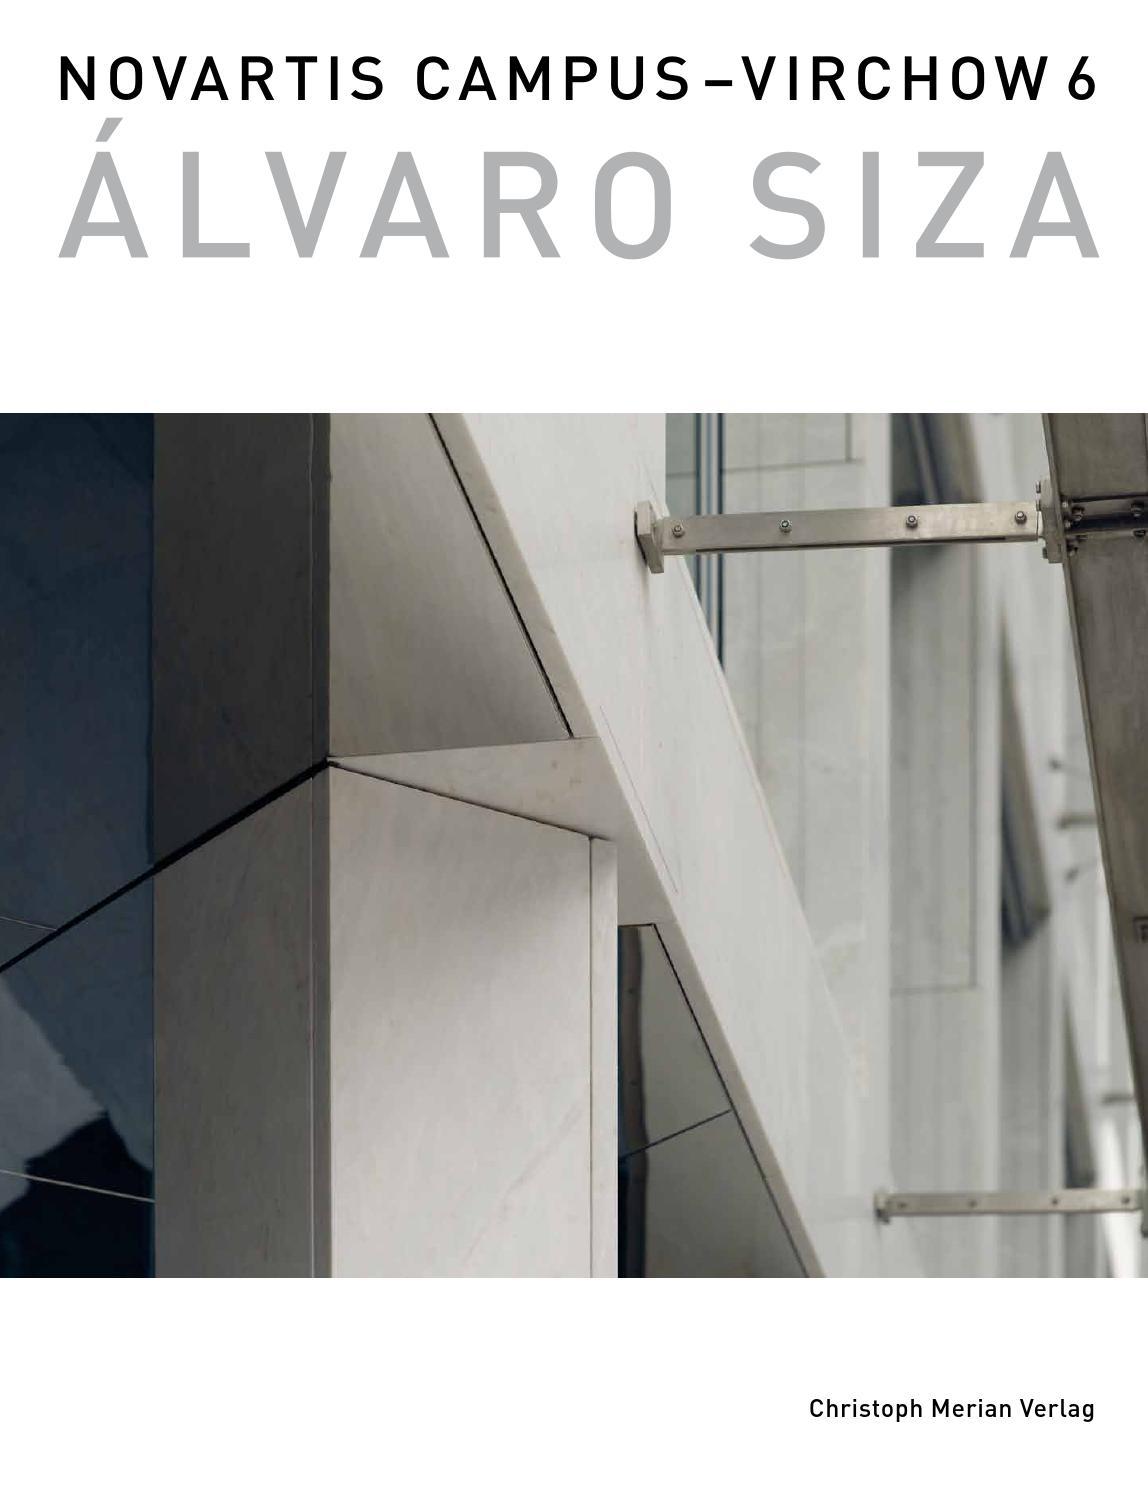 Novartis Campus-Virchow 6 by Christoph Merian Verlag - issuu